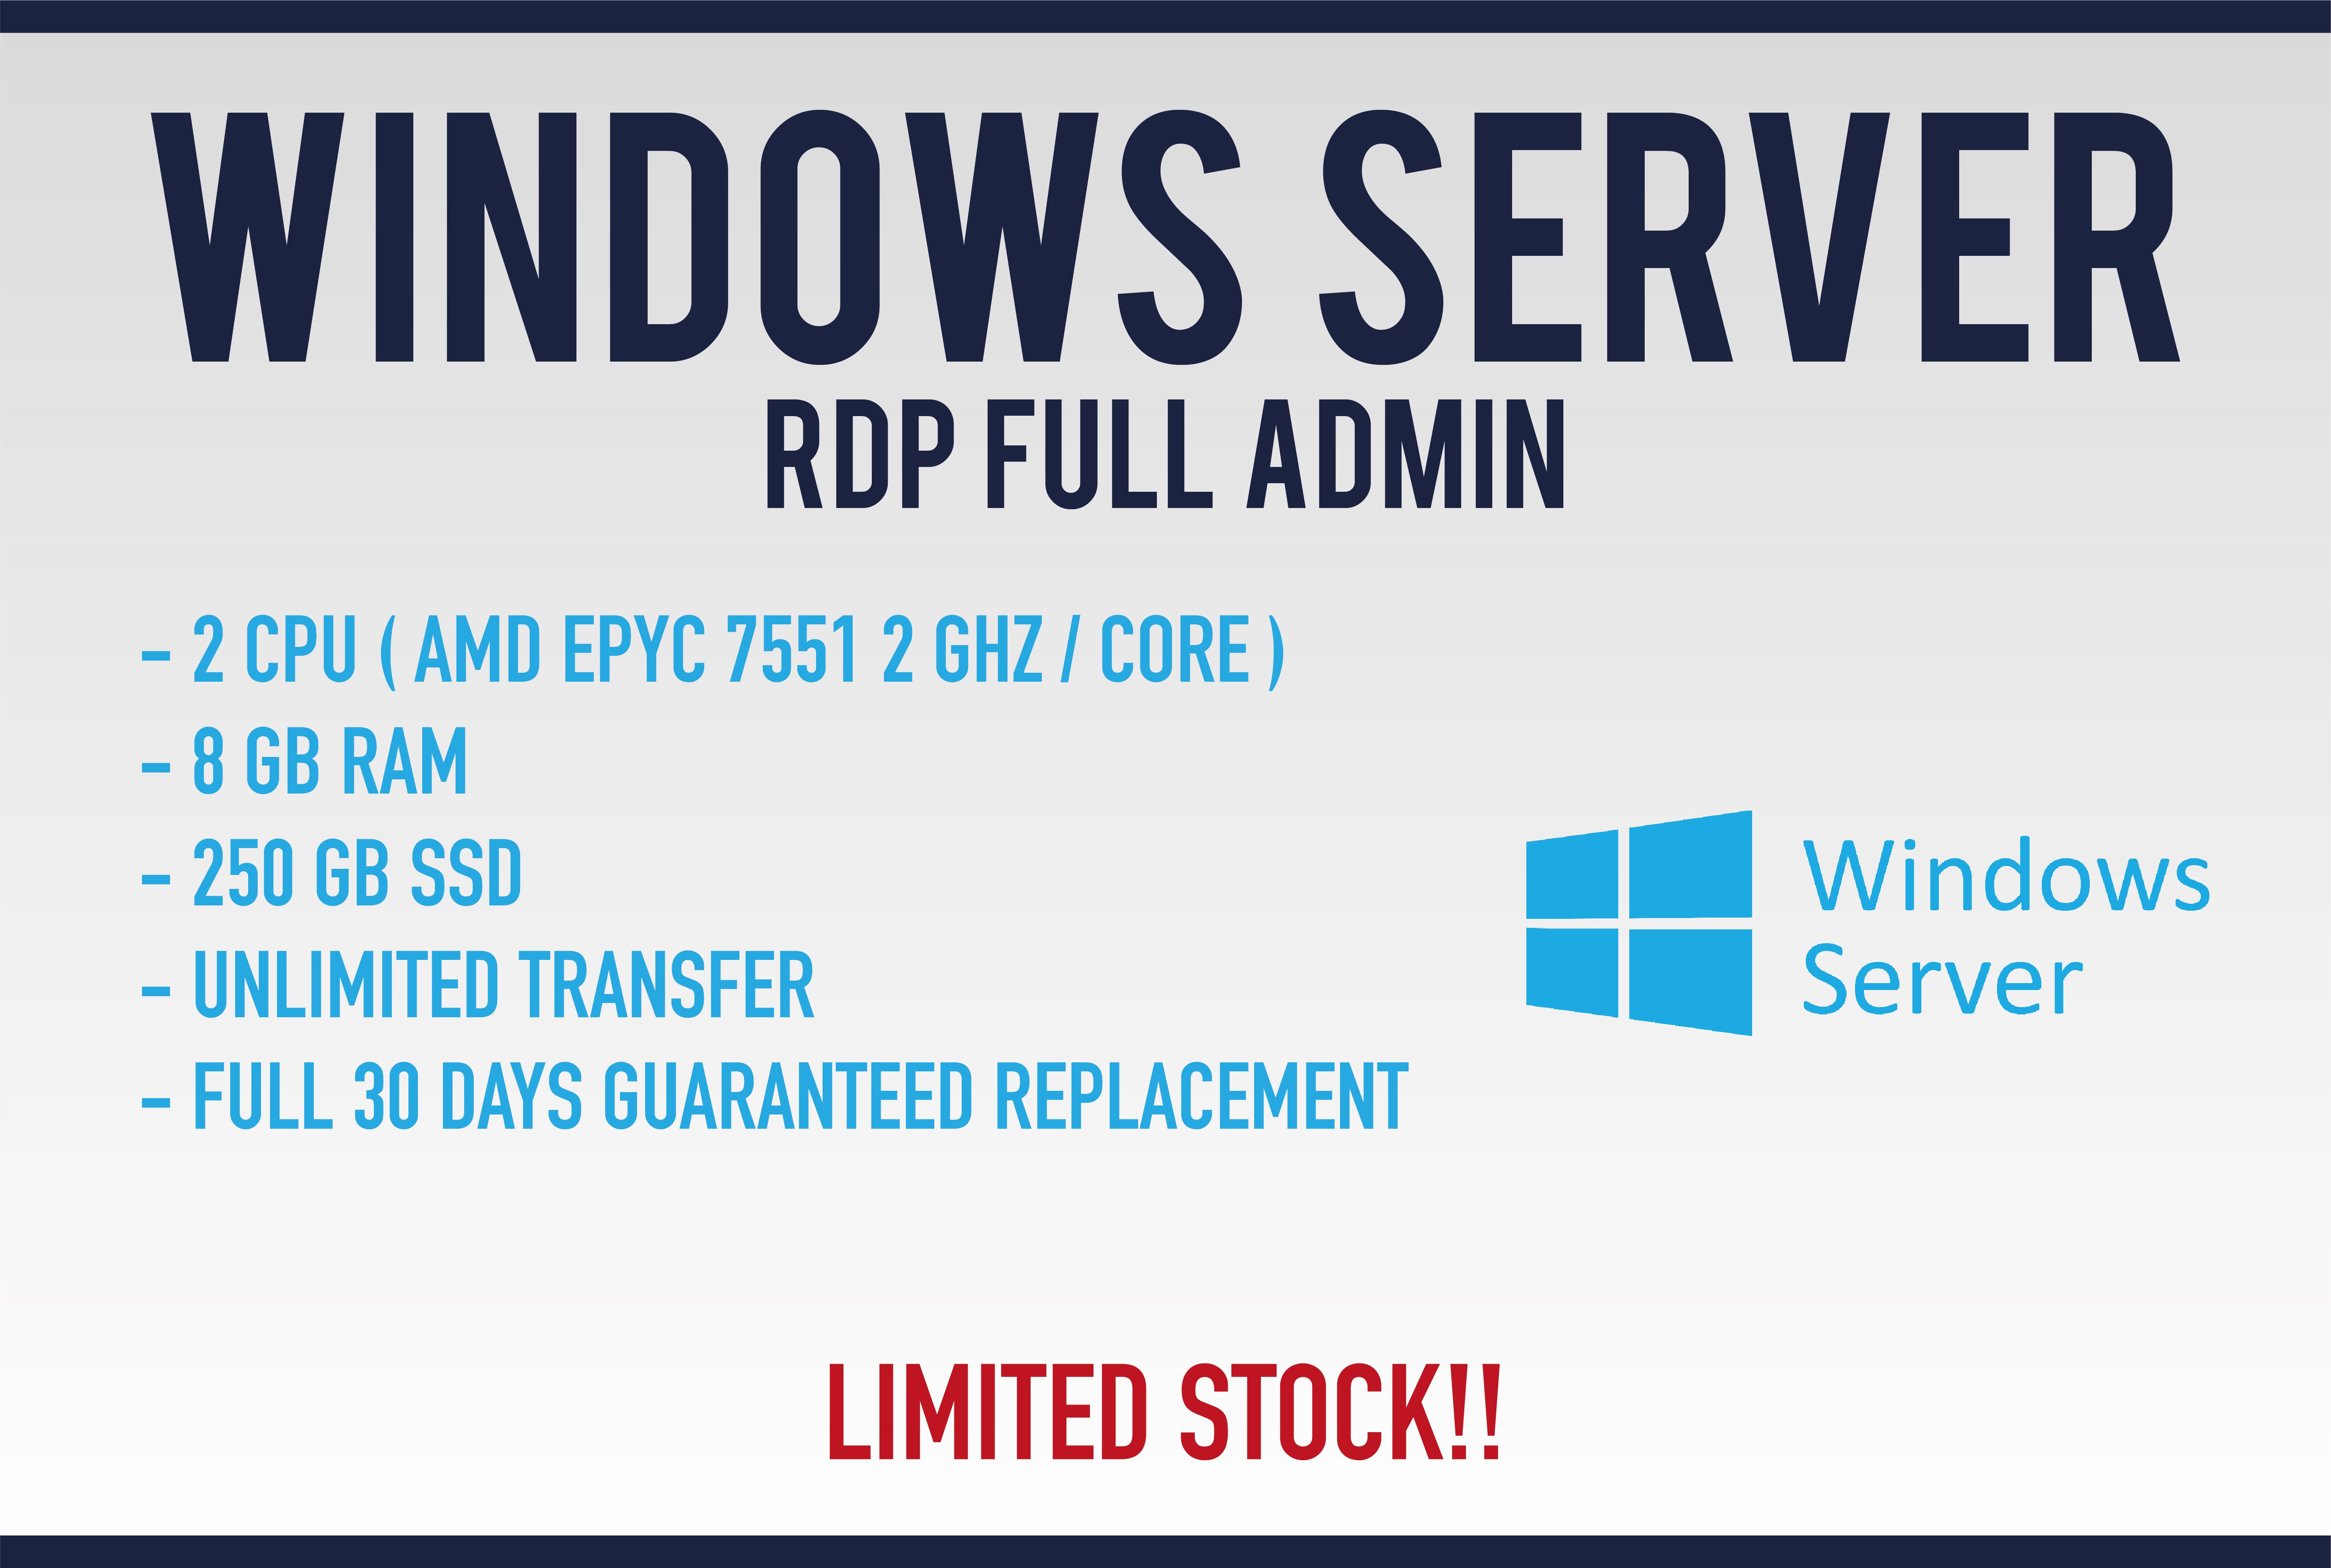 Dedicated Windows Server RDP Vps 8 gb ram 250 gb ssd